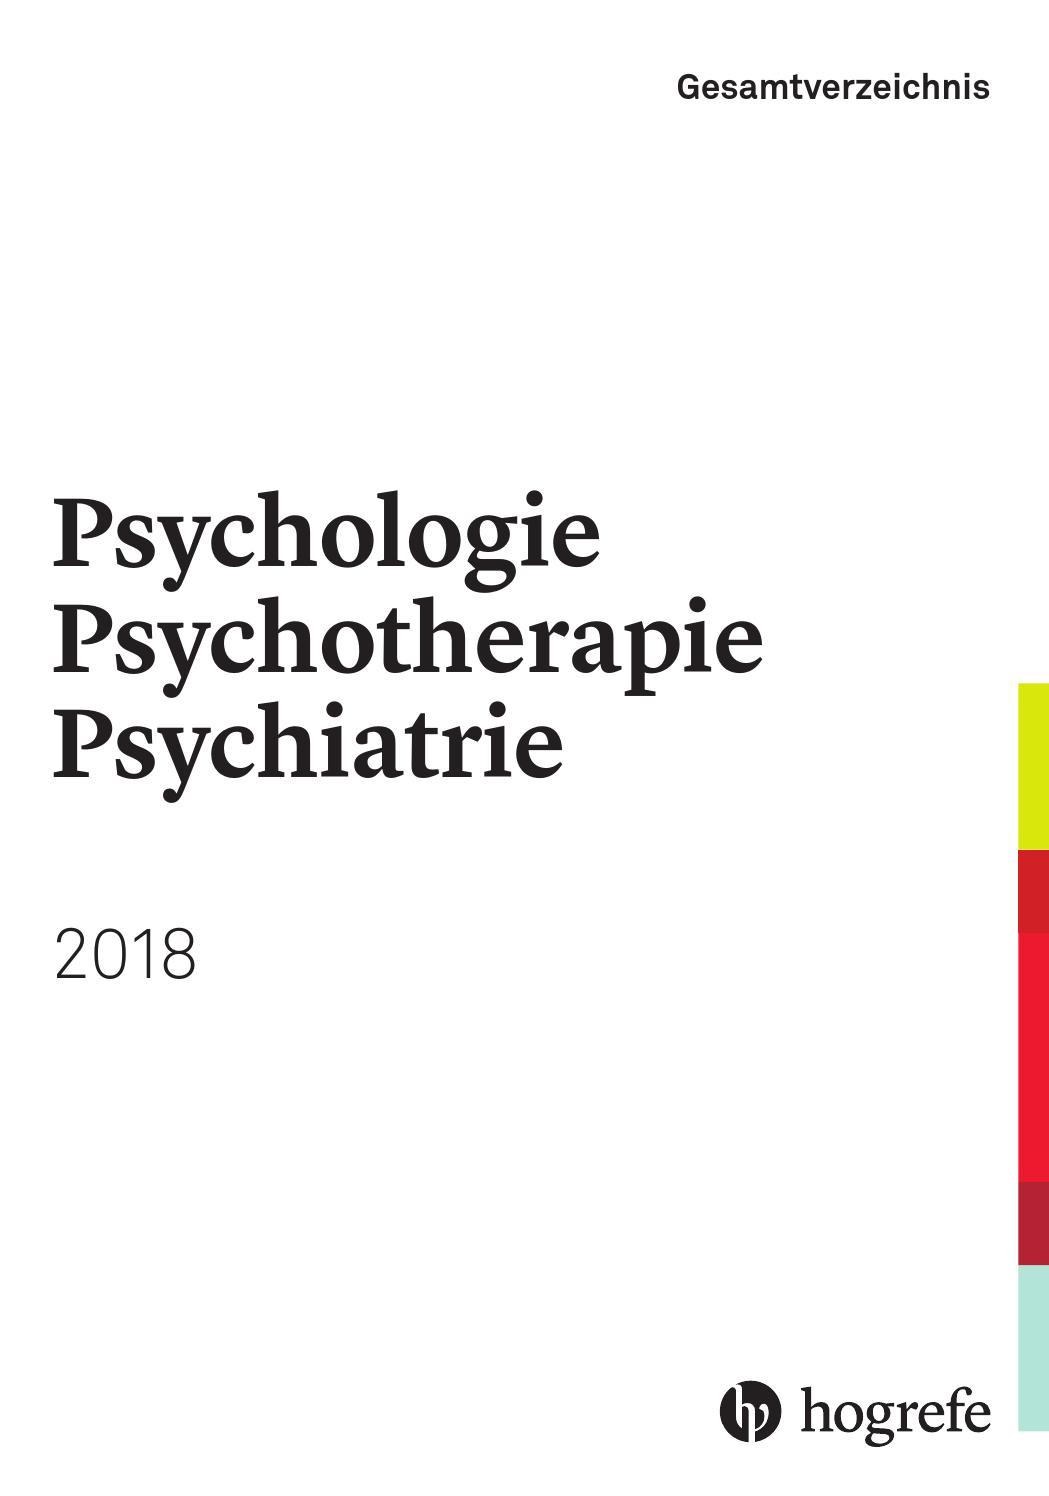 Hogrefe Gesamtverzeichnis Psychologie, Psychotherapie, Psychiatrie ...